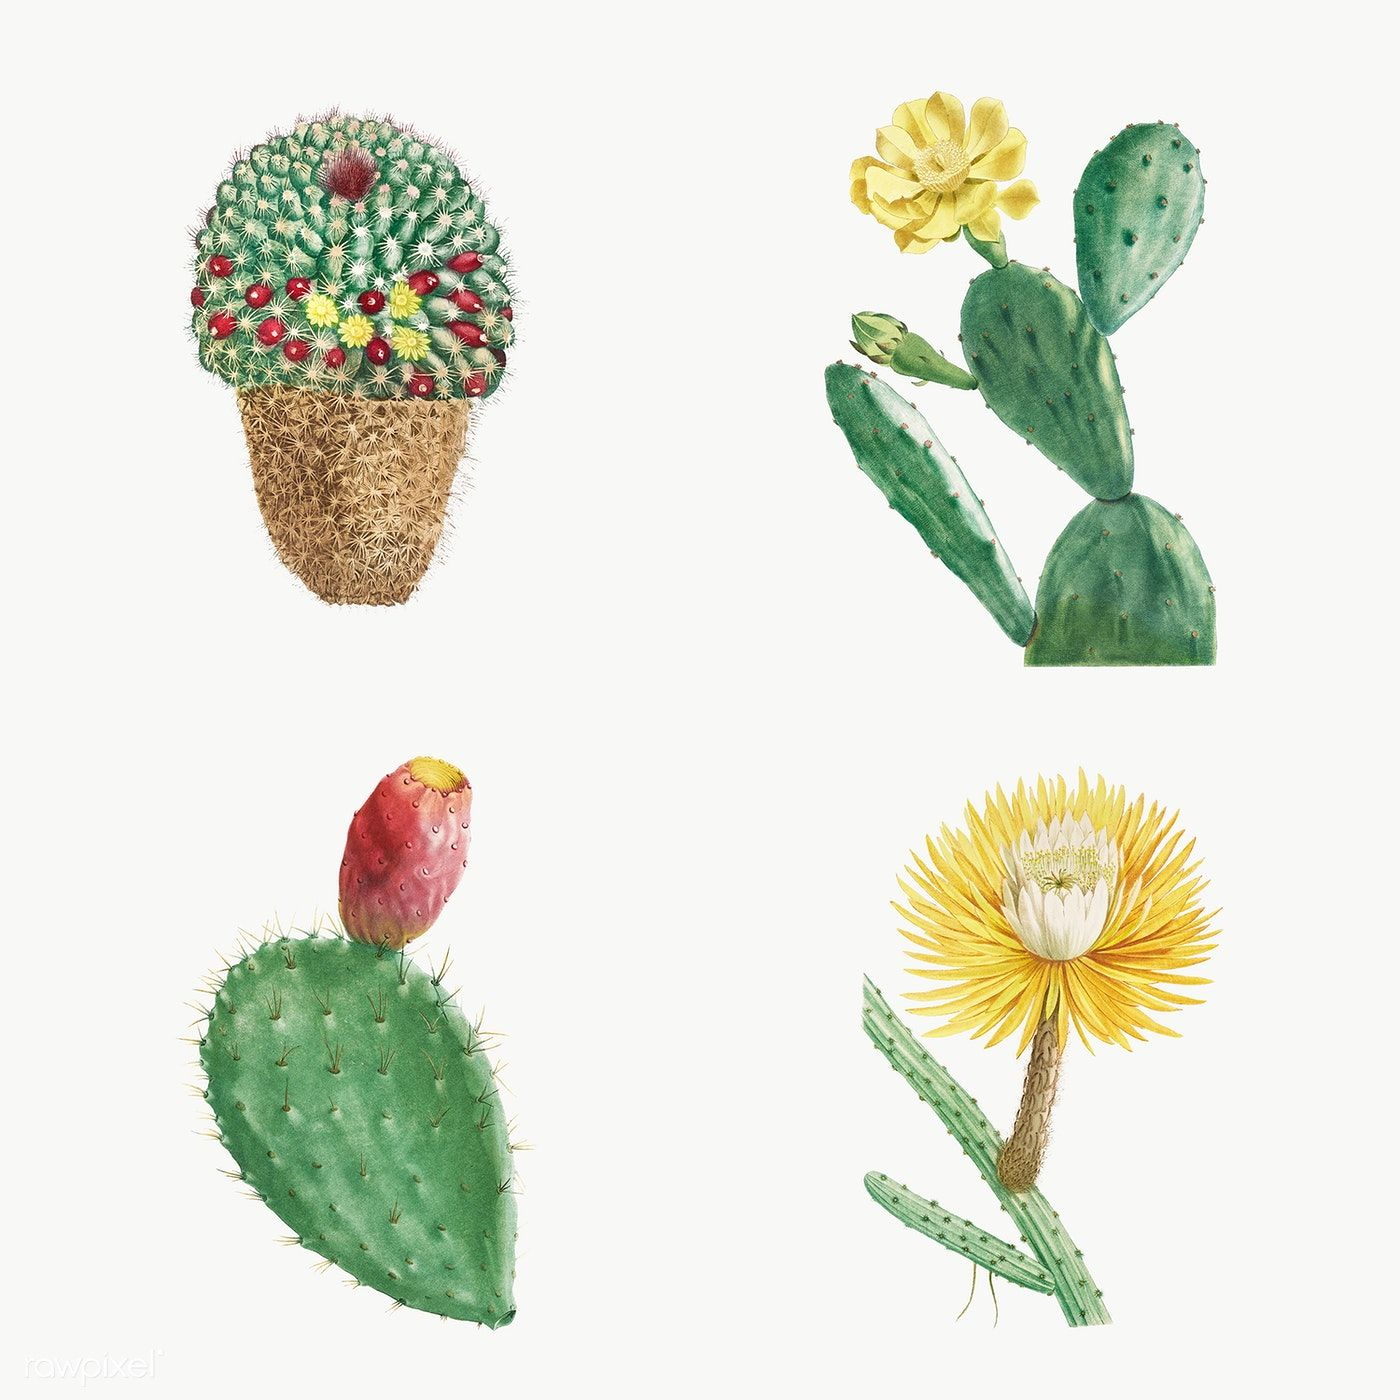 Set Of Succulents And Cacti Transparent Png Premium Image By Rawpixel Com Cactus Illustration Flower Illustration Cactus Flower Painting